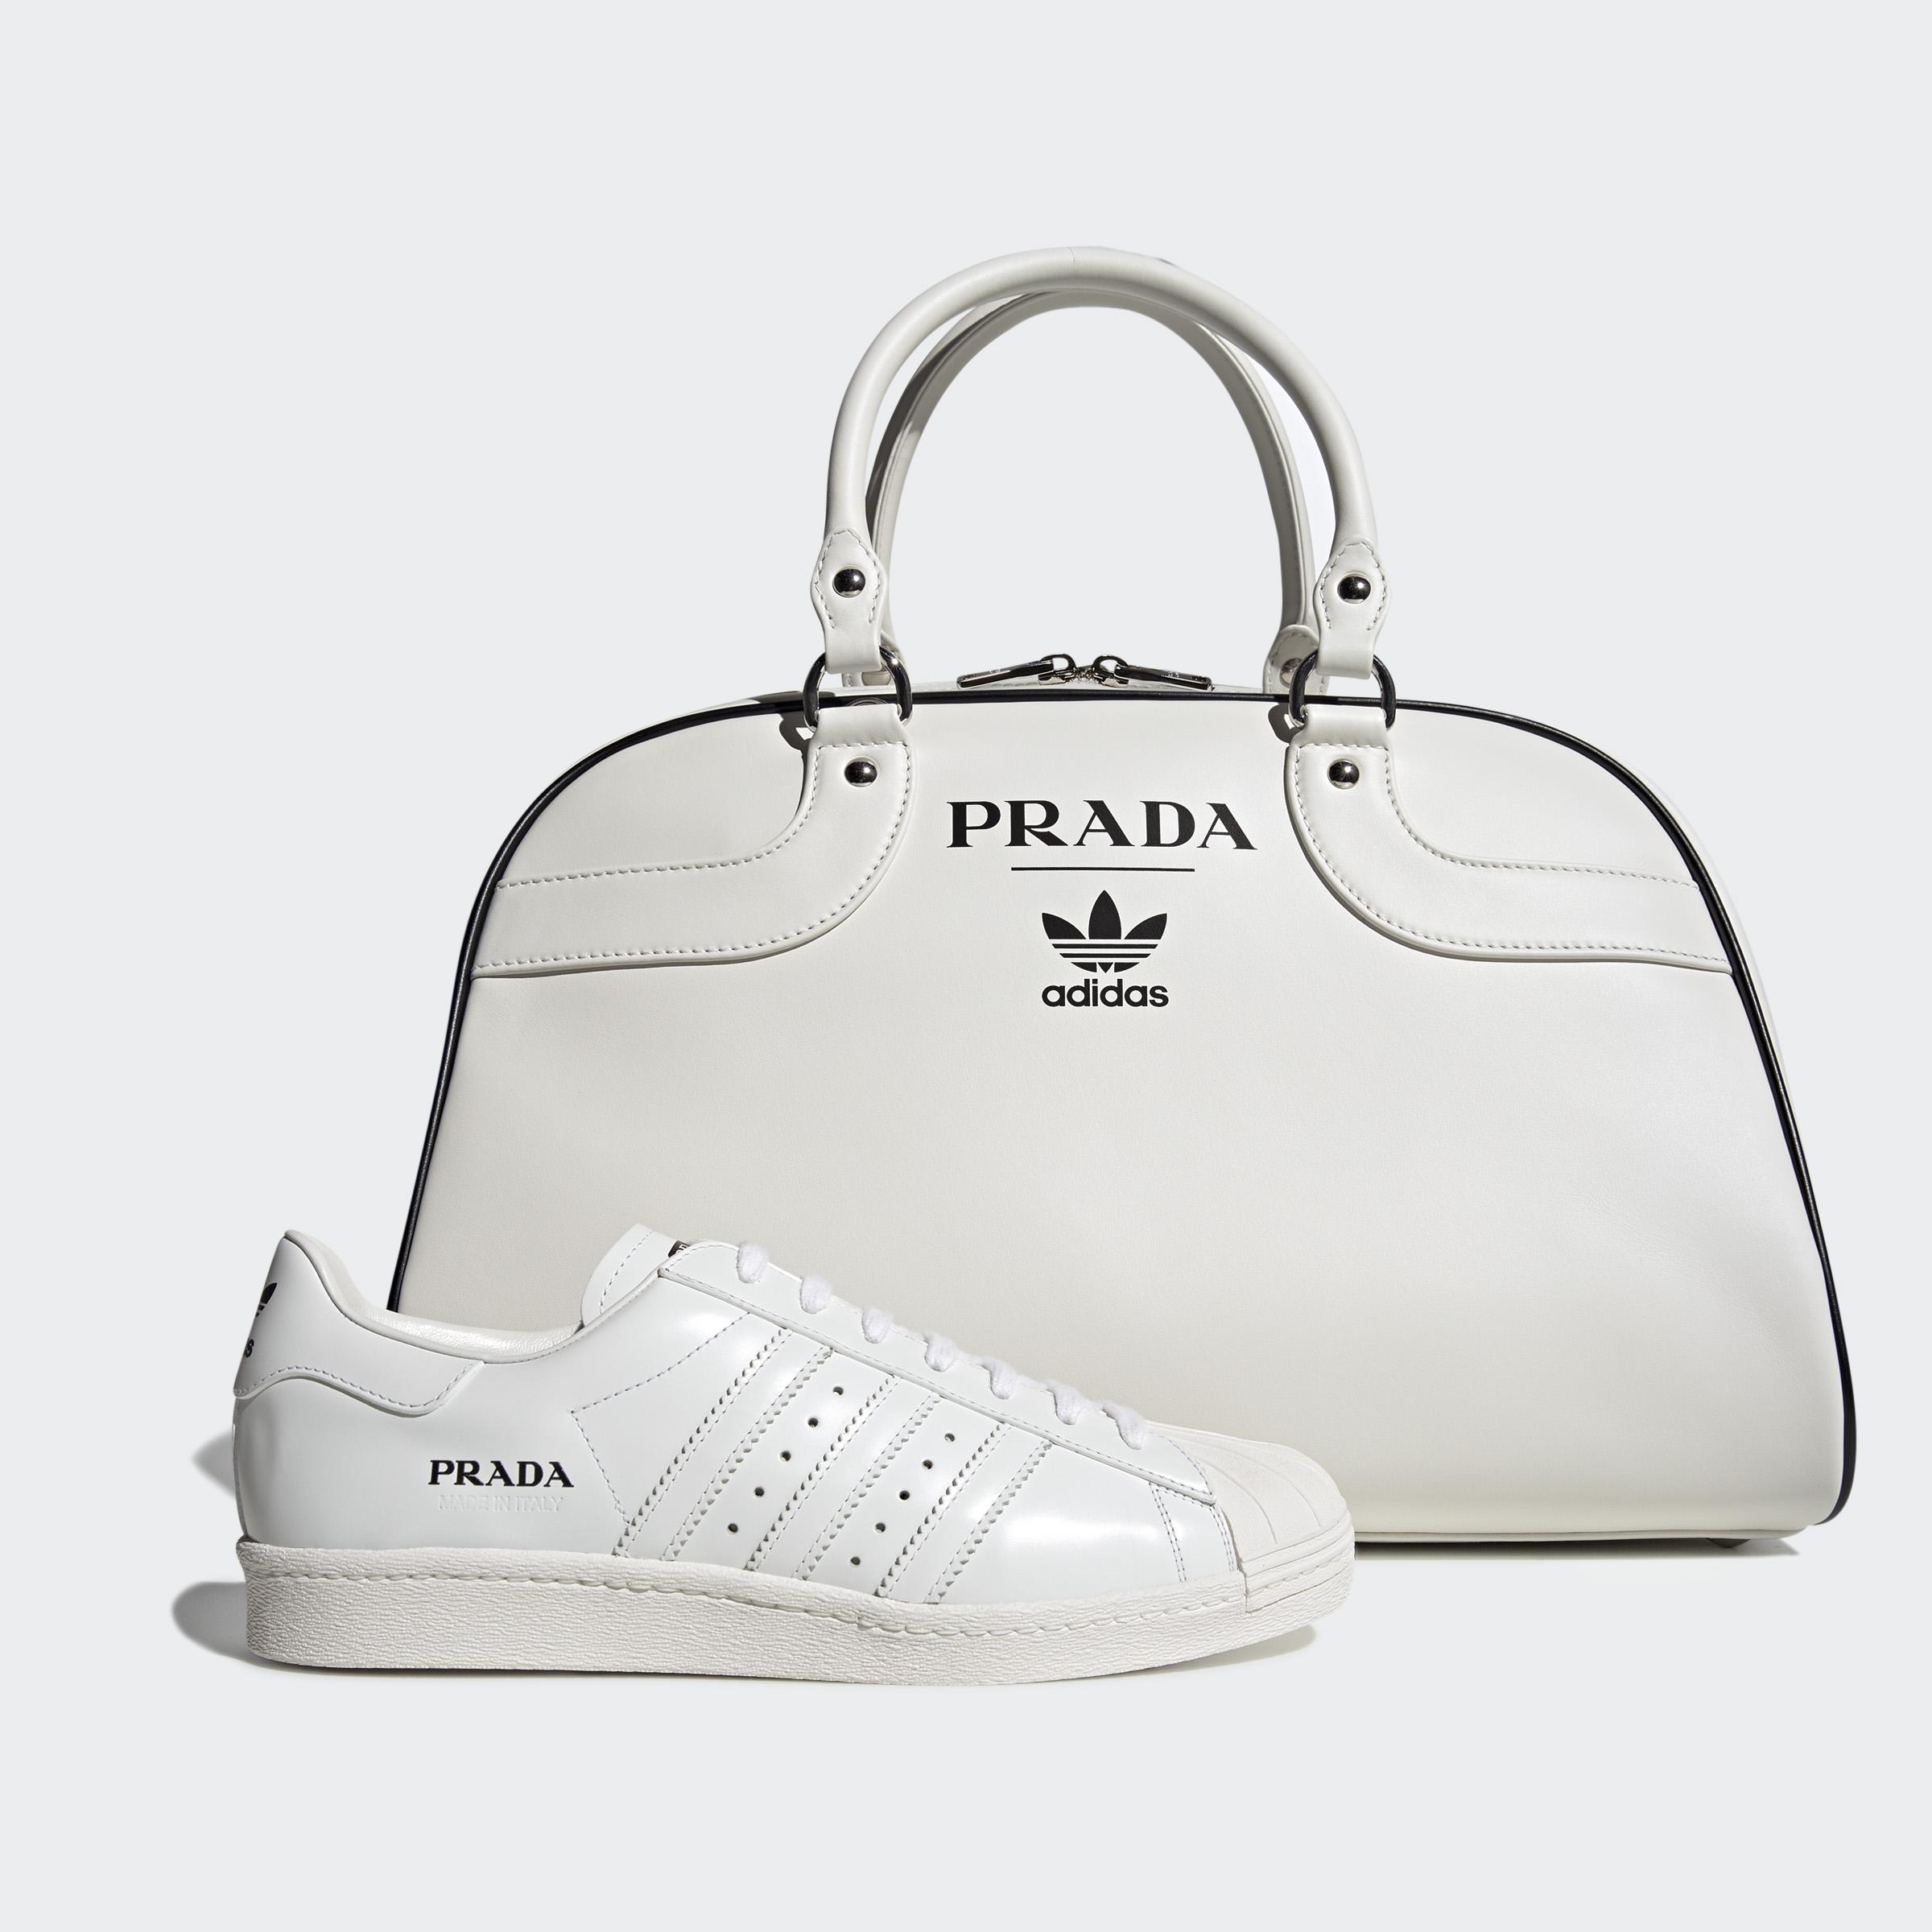 Dar permiso progresivo Psicológico  Prada and Adidas release limited edition Superstar trainers and bowling bag  - i-D